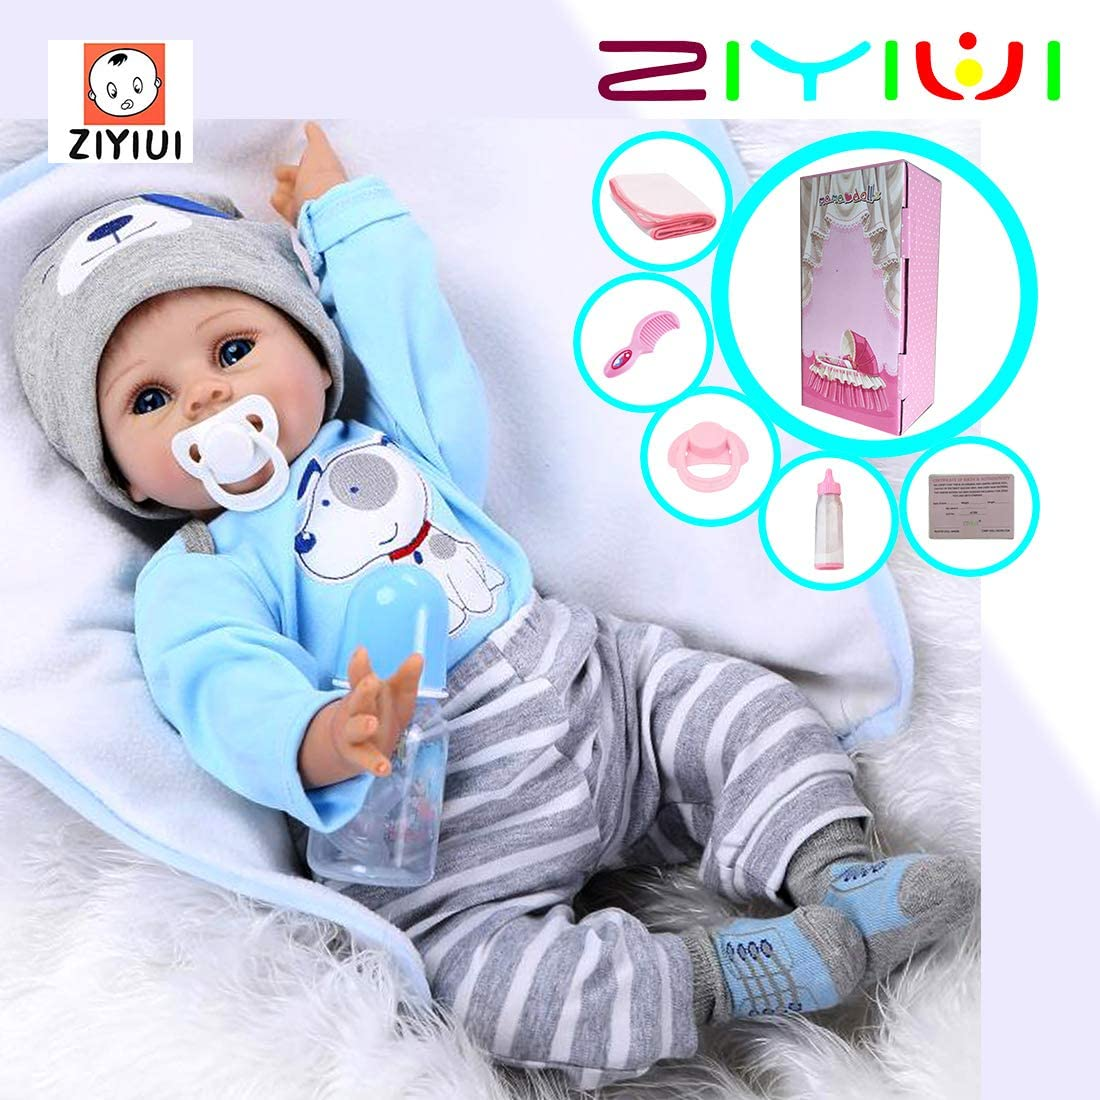 ZIYIUI Tiny treasures Toddler 22inches 55cm reborn doll Newborn baby doll Soft silicone vinyl Realistic doll Best xmas gift Reborn baby doll